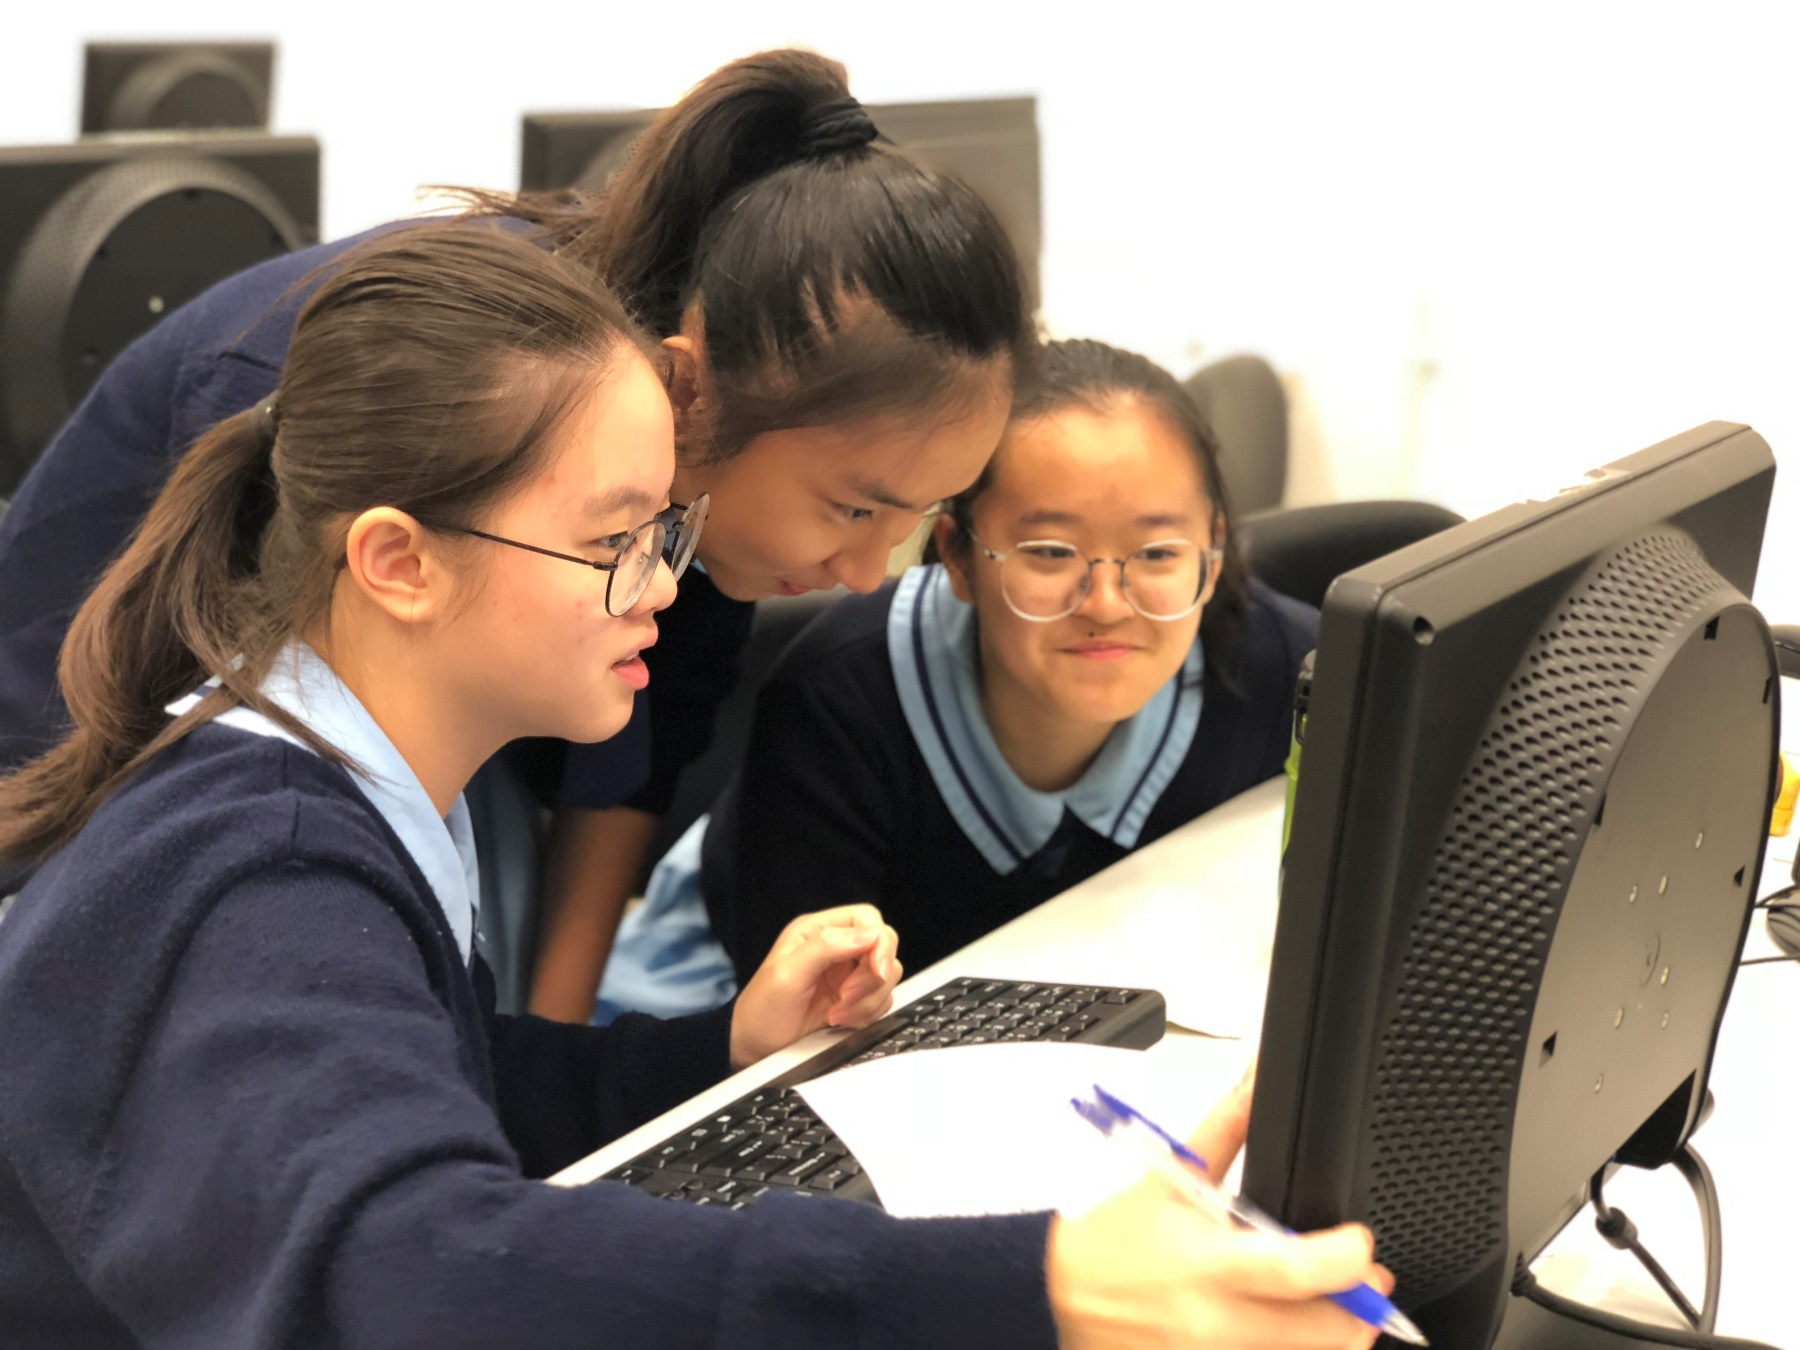 http://npc.edu.hk/sites/default/files/img_0186.jpg